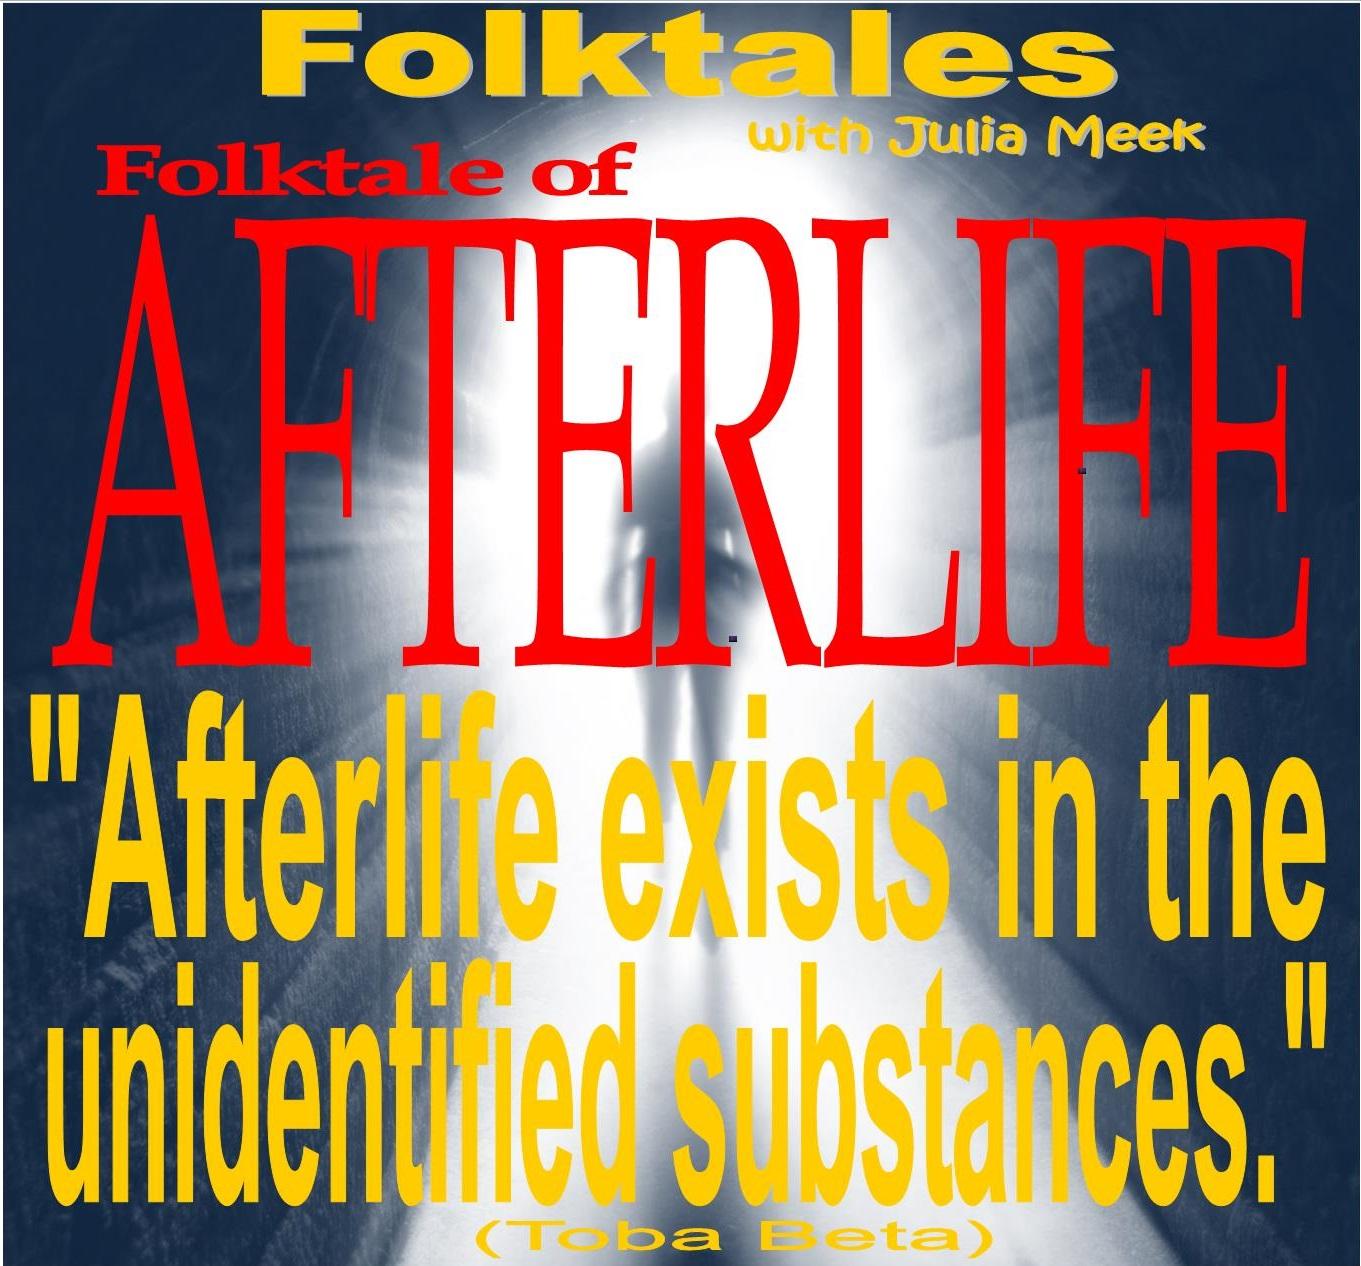 Caption: WBOI's Folktale of the Afterlife, Credit: Julia Meek